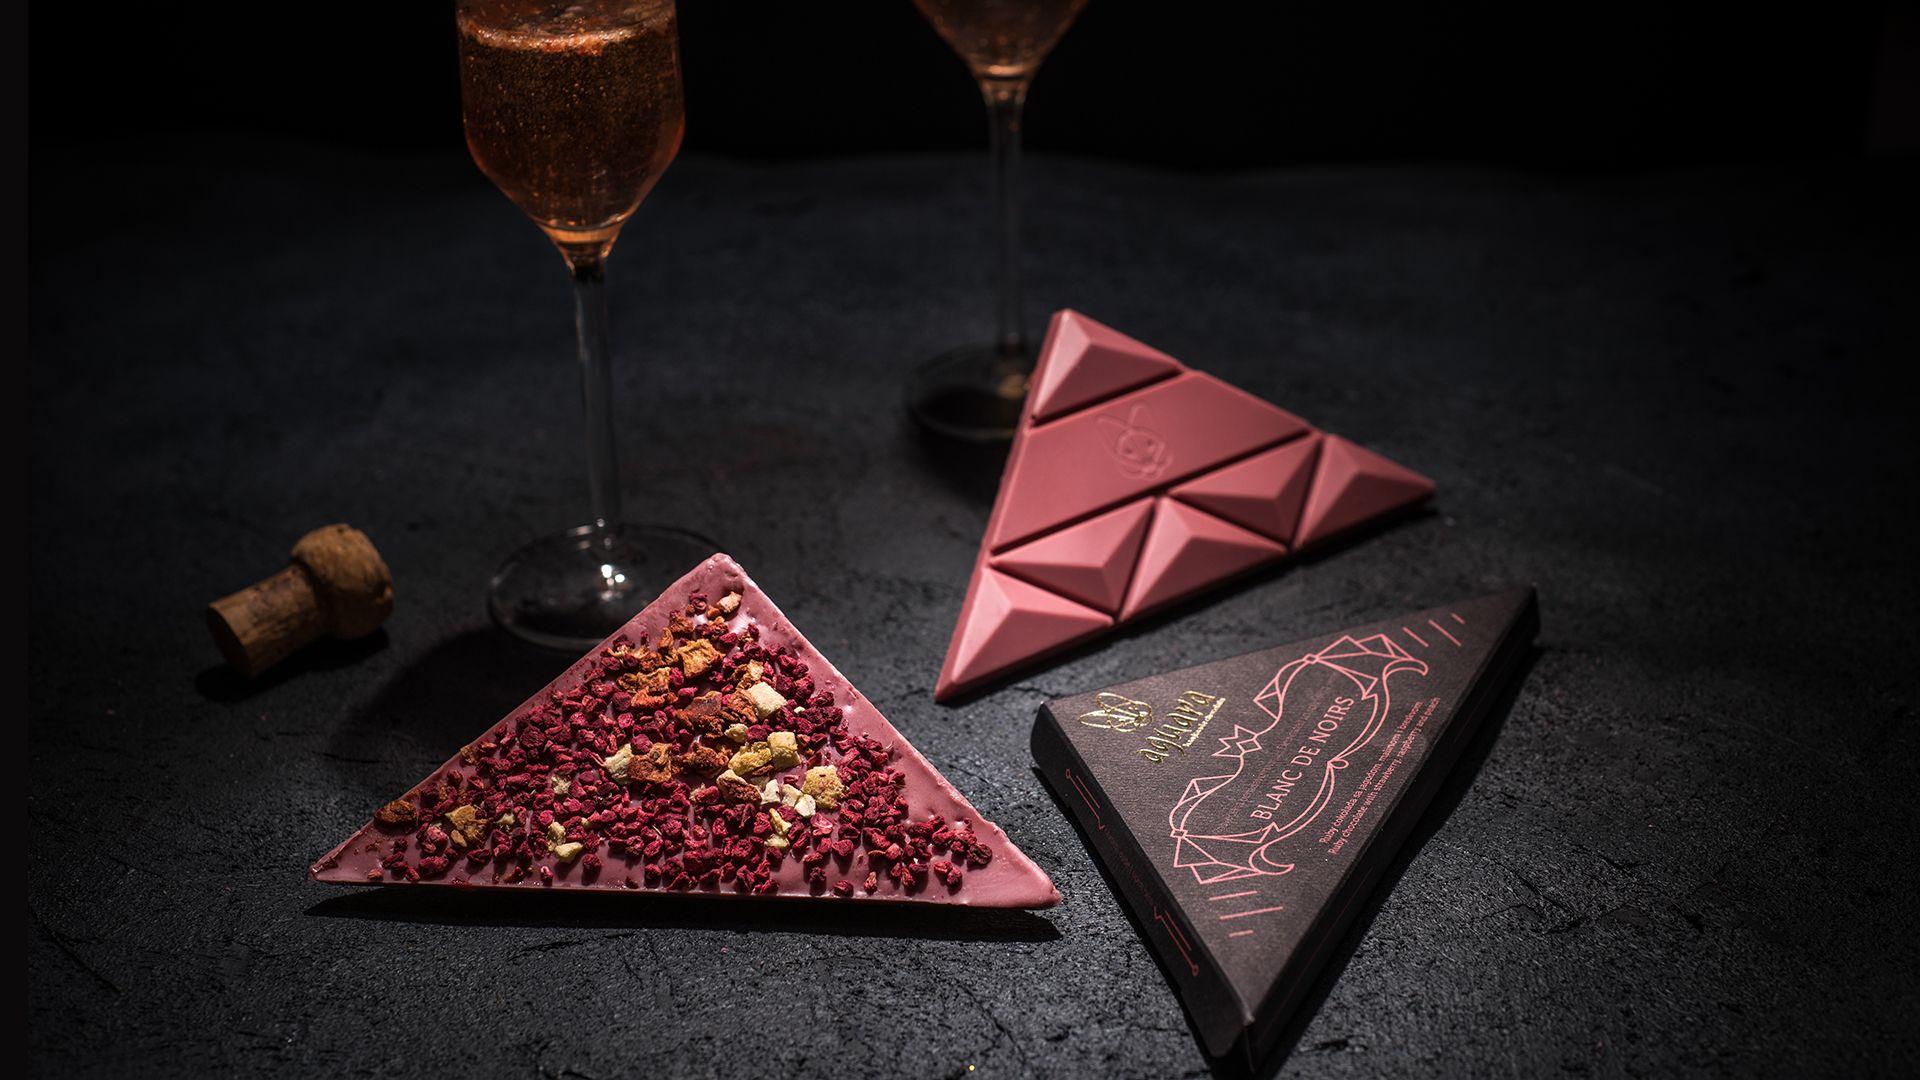 Aguara chocolate dedicated to sparkling wine Blanc de Noirs